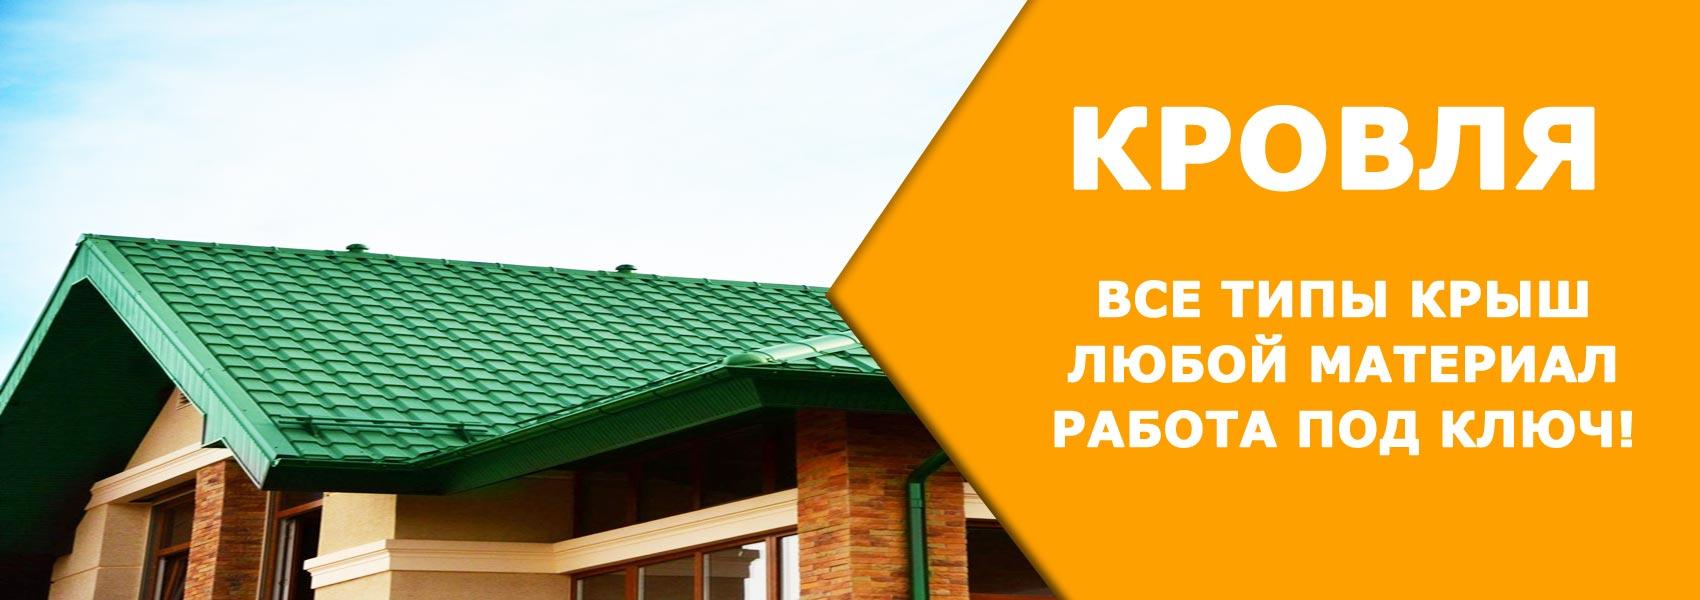 Монтаж кровли раменский район